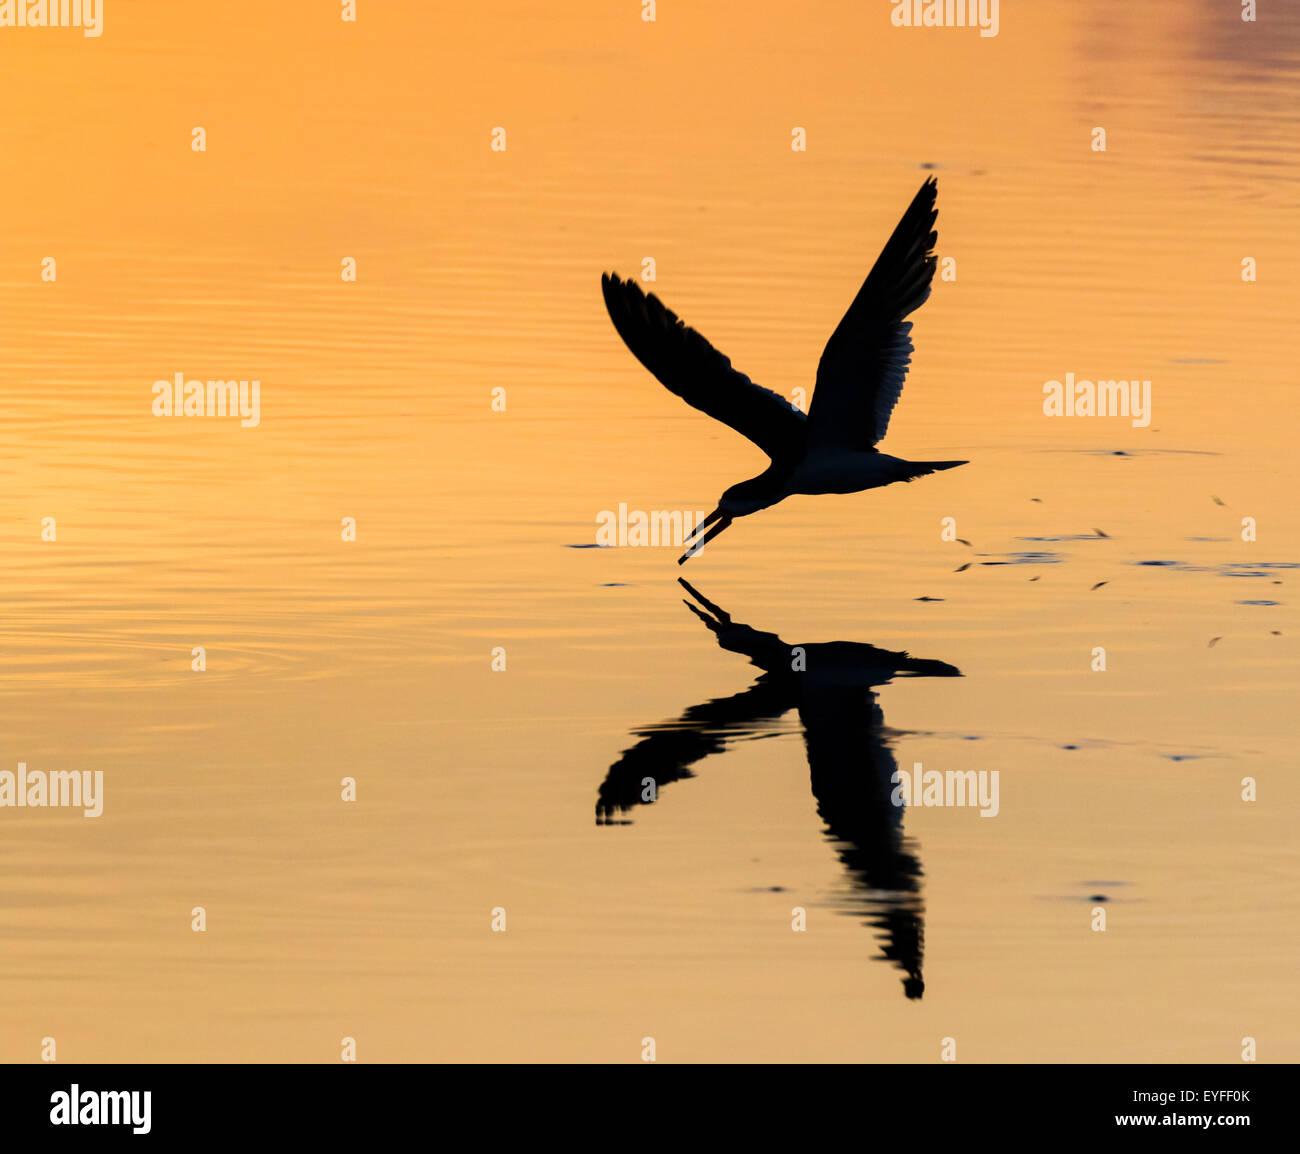 Black skimmer (Rynchops niger) hunting at sunrise in seashore, Galveston, Texas, USA. - Stock Image